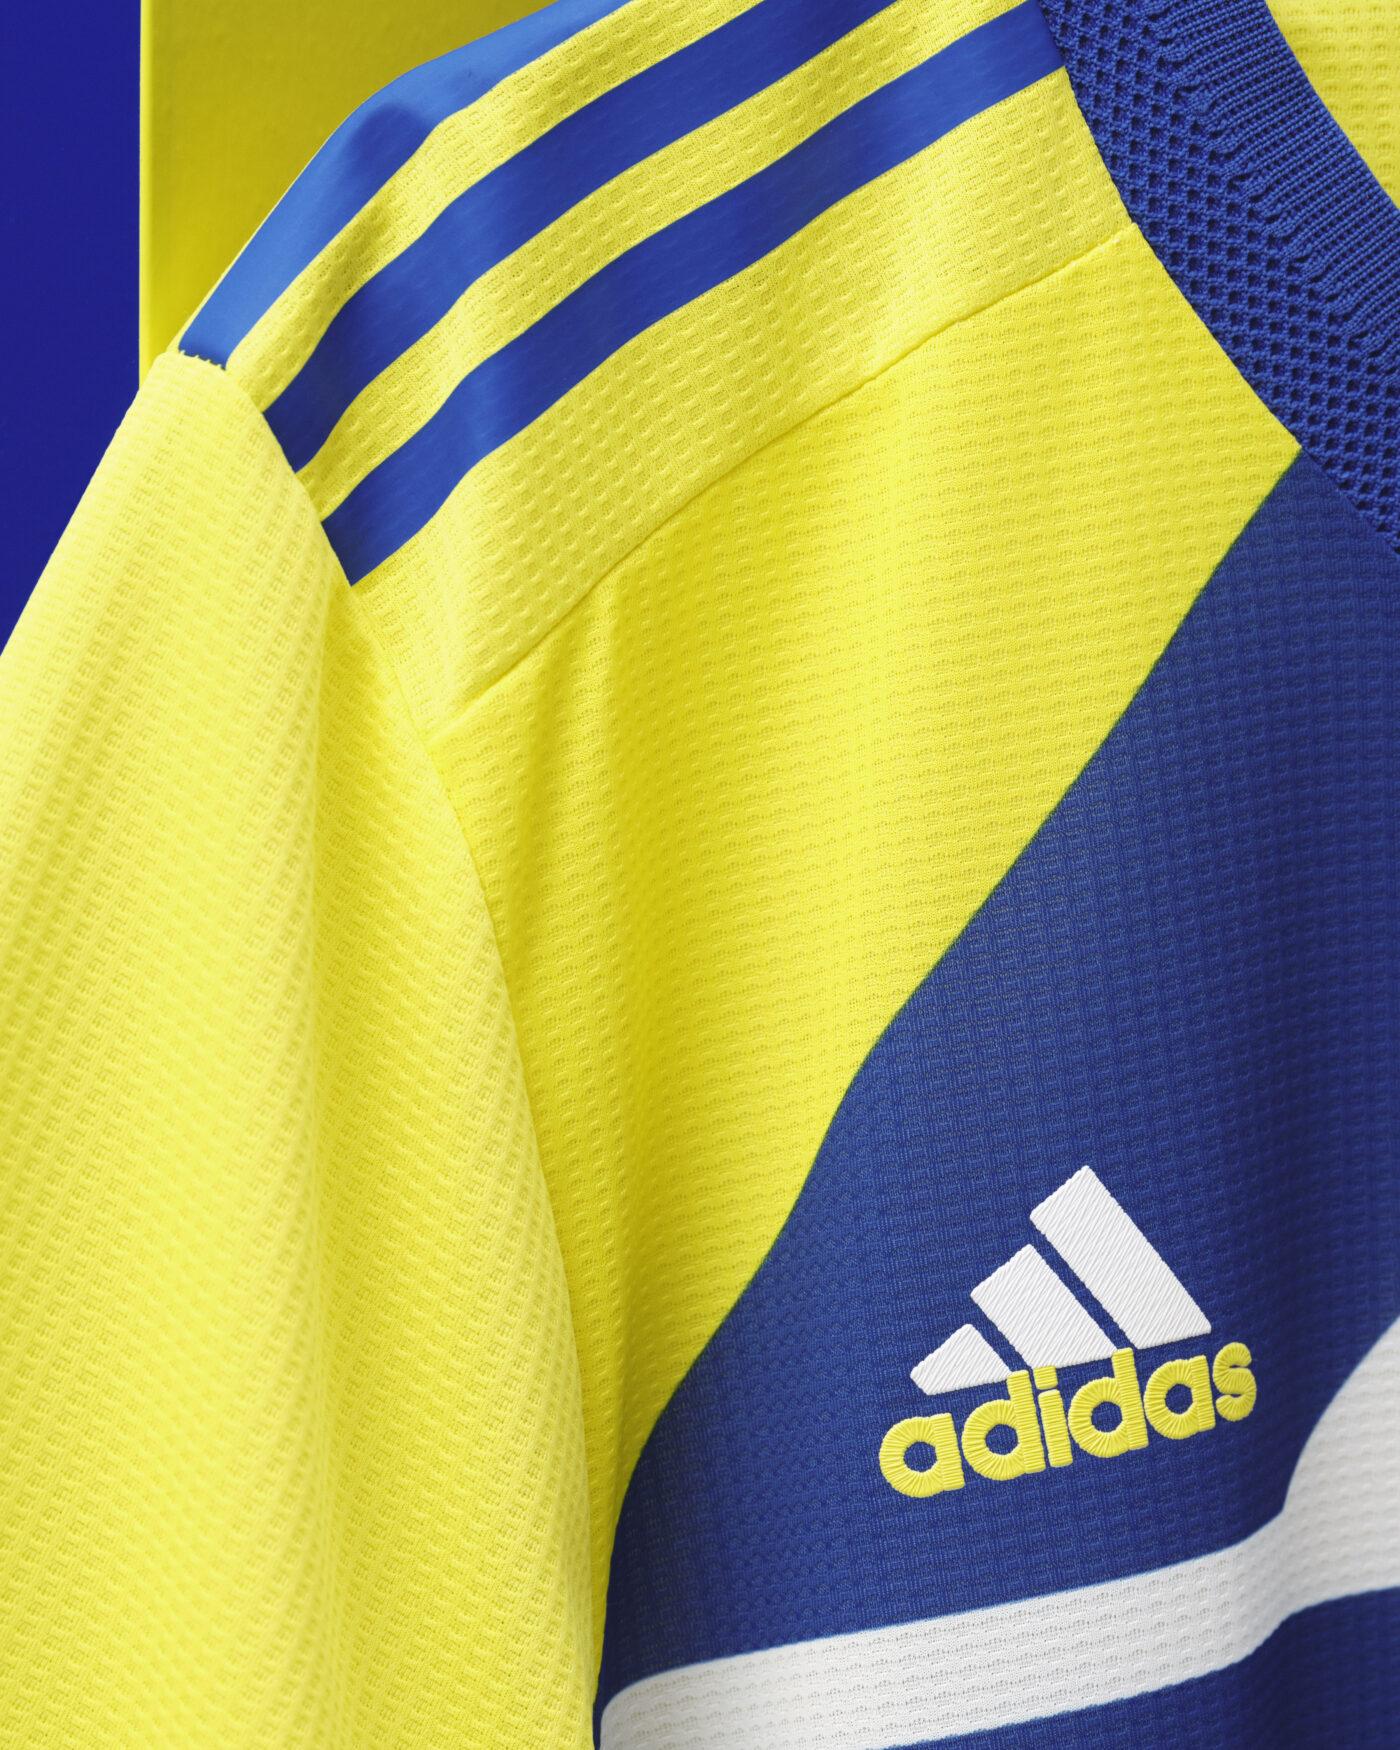 Maillot Juventus 2021-2022 third - footpack